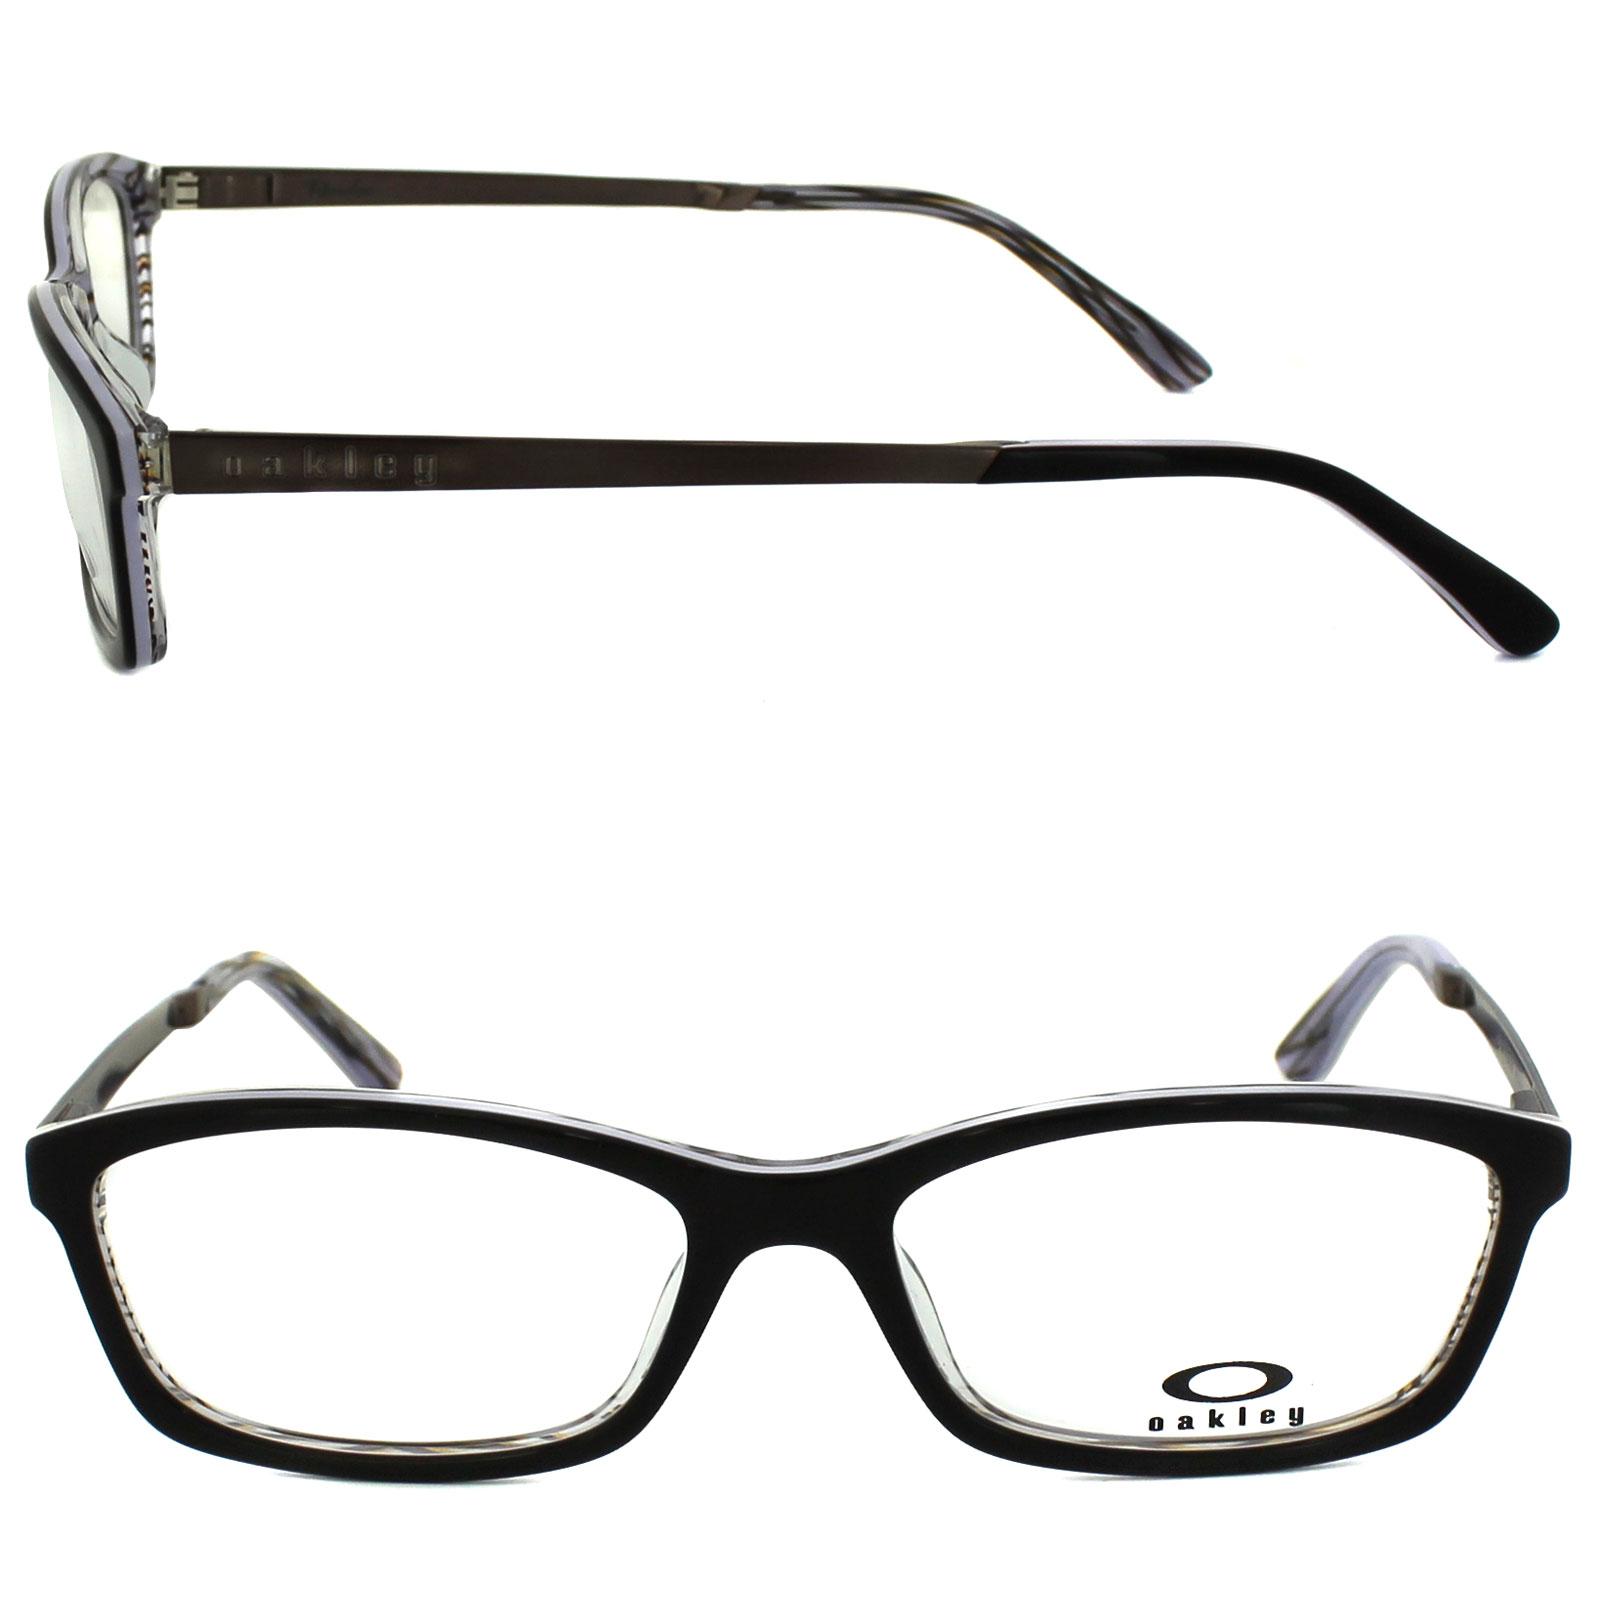 Cheap Oakley Prescription Sunglasses Uk 2014 Louisiana